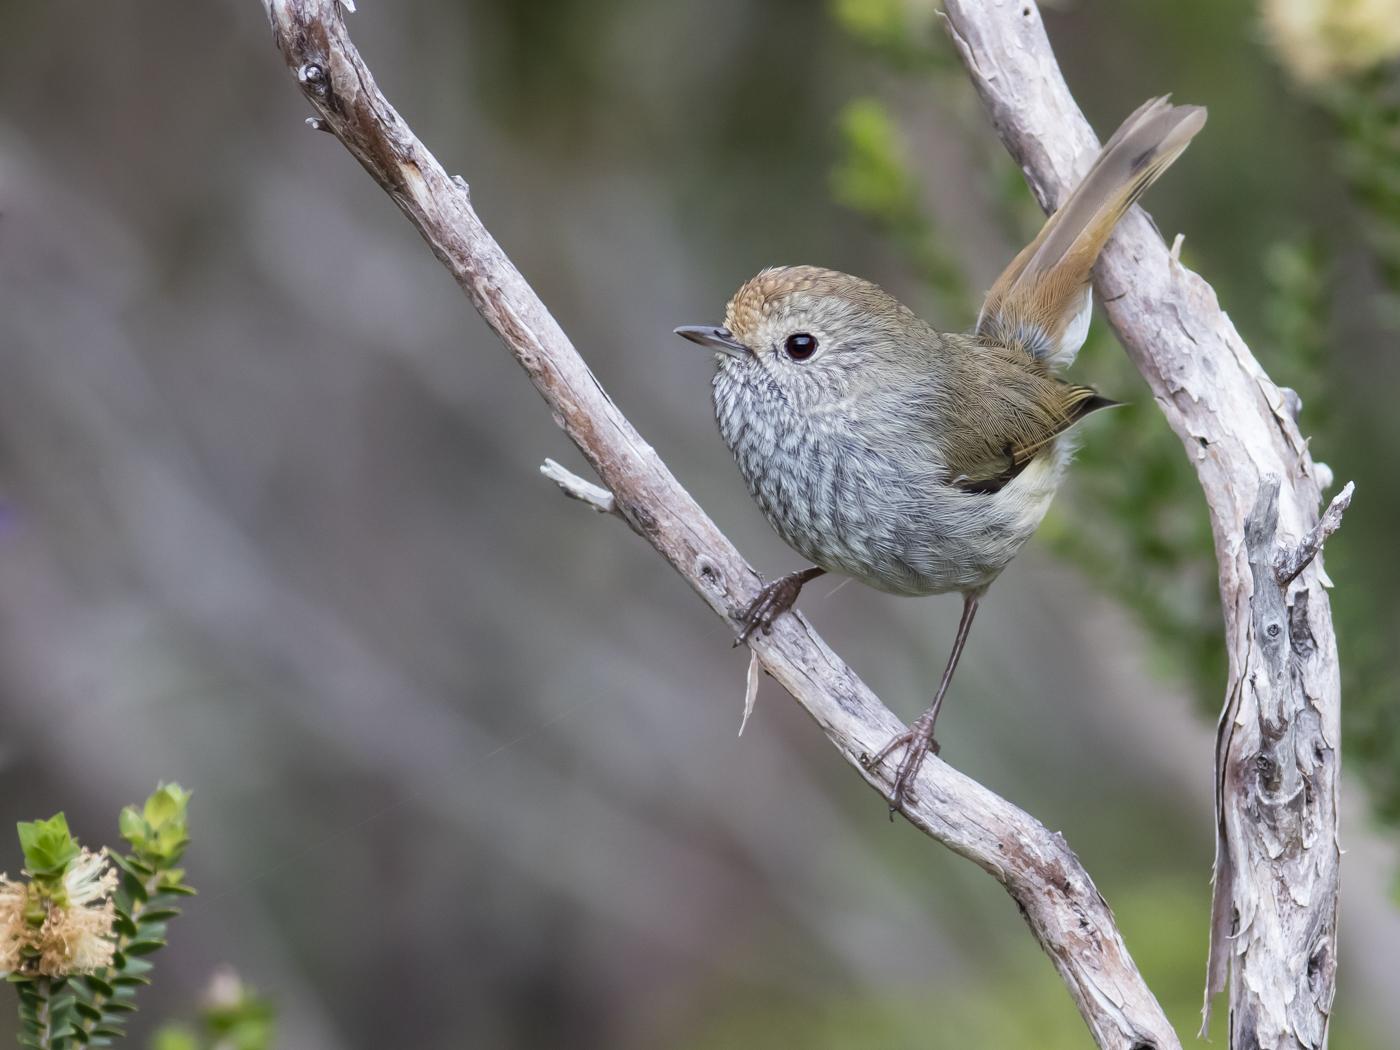 Tasmanian Thornbill